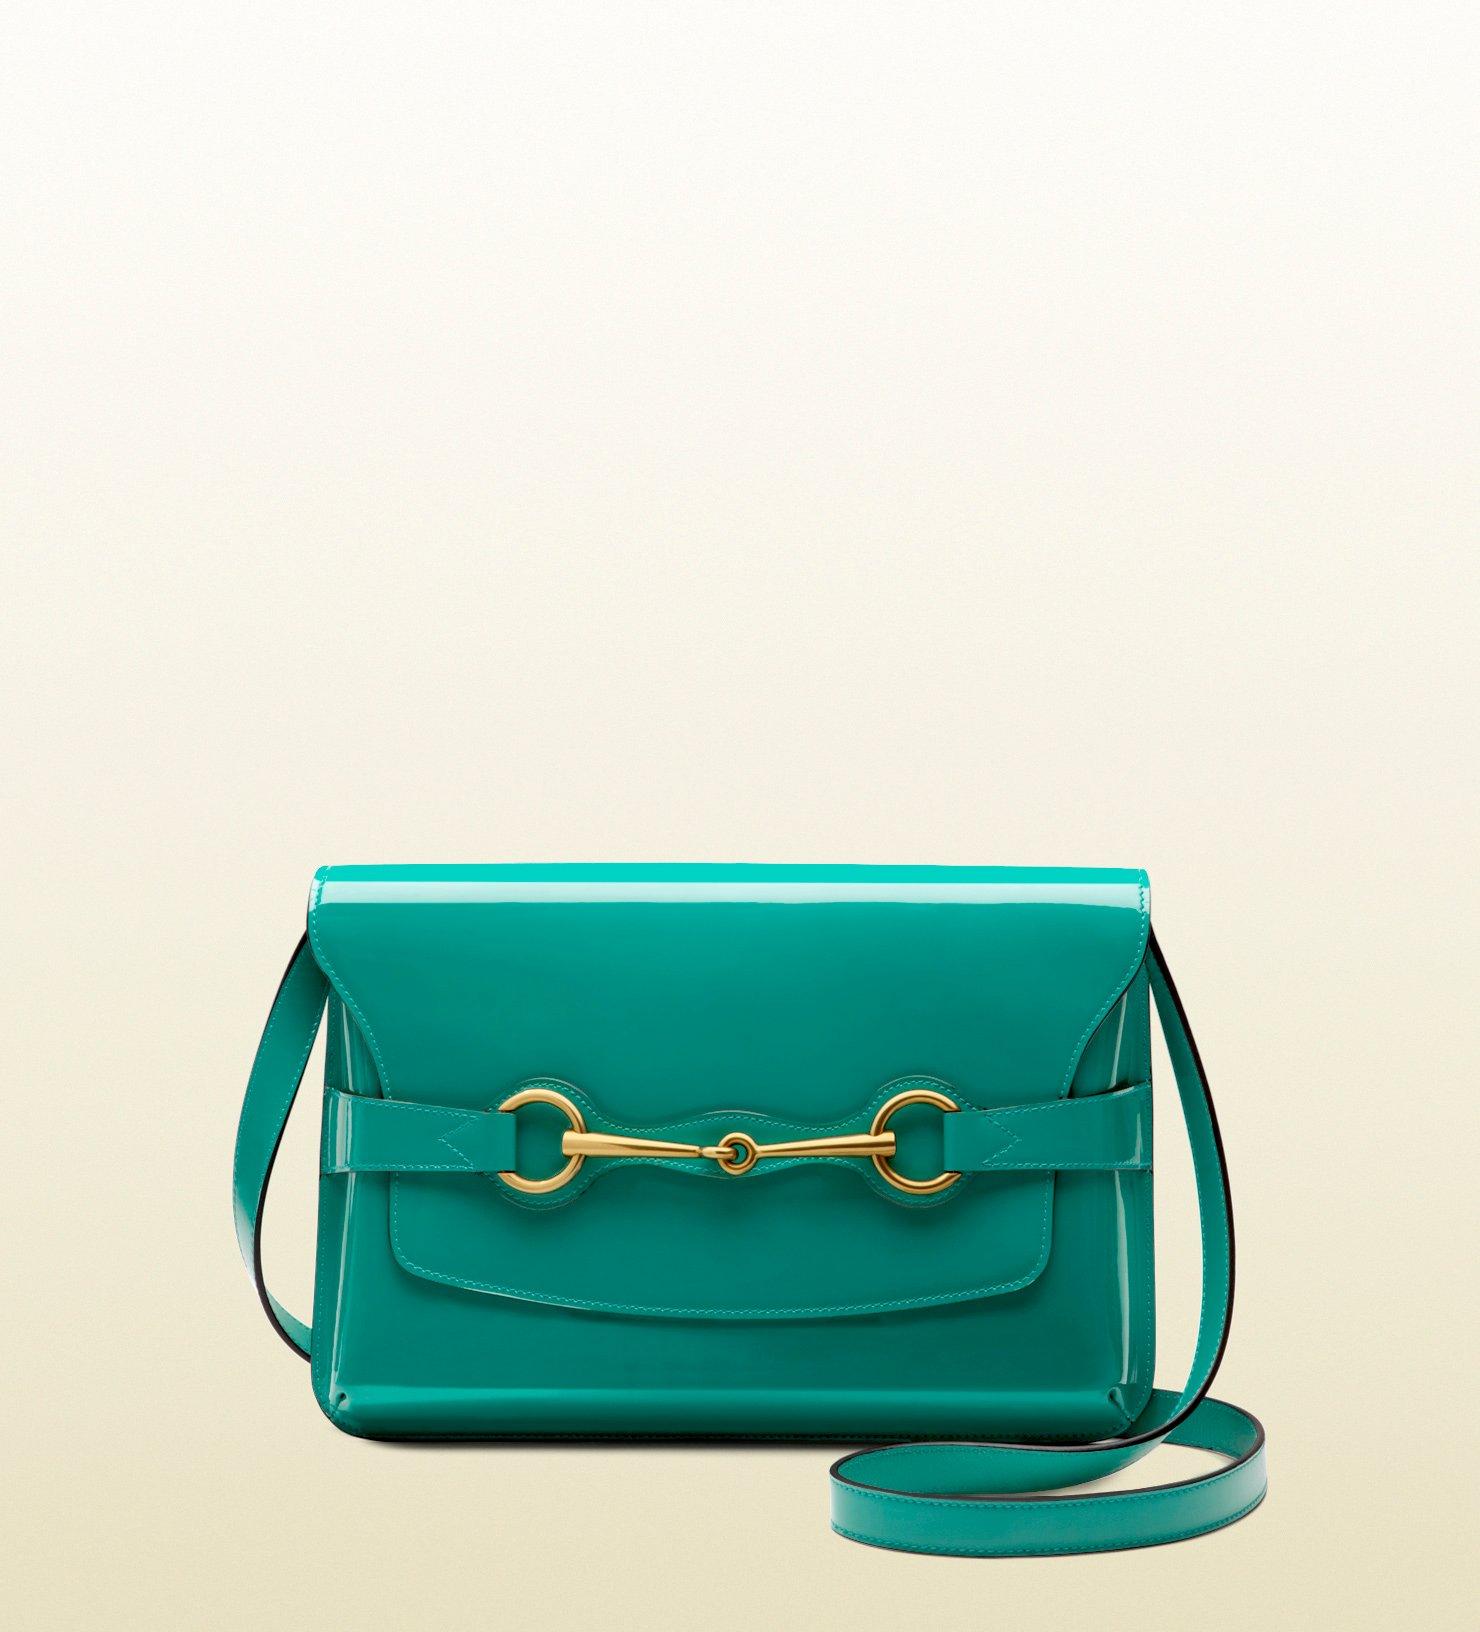 eaf6b8f7336 Lyst - Gucci Bright Bit Patent Leather Shoulder Bag in Green